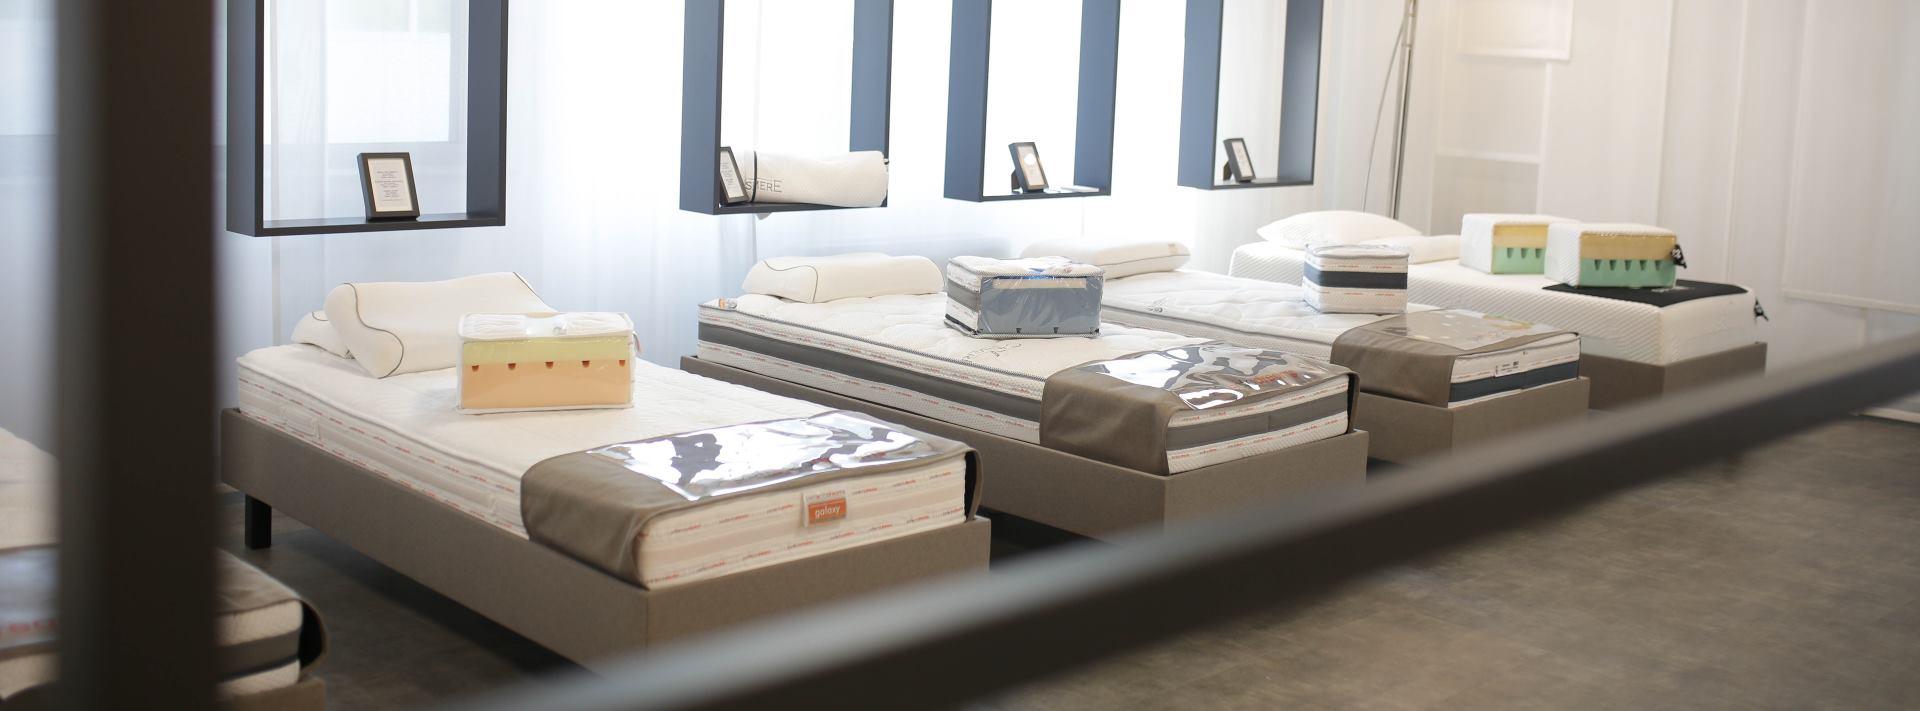 Centar spavanja Perfecta Dreams nudi tisuću razloga za dobar san